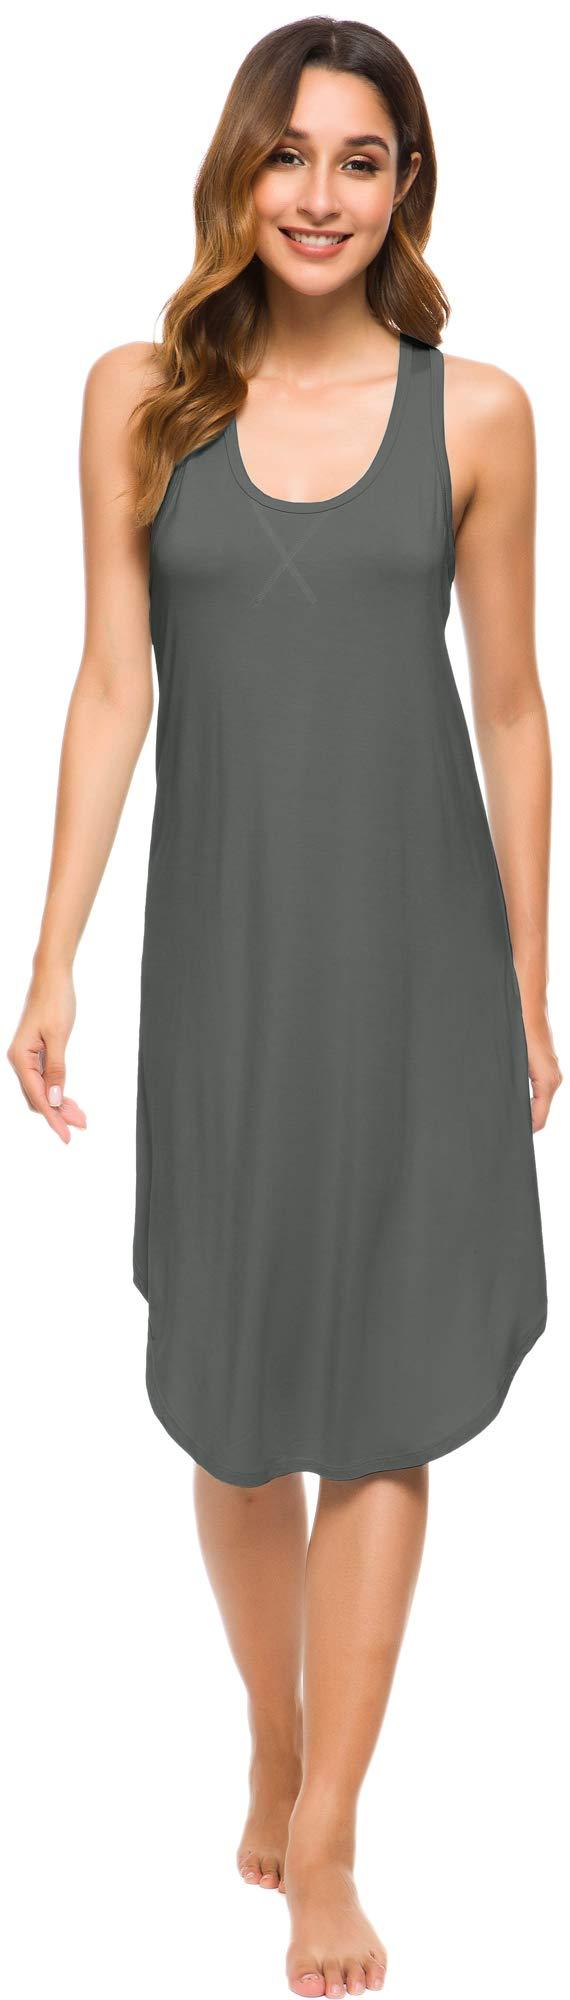 WiWi Womens Soft Bamboo Pajamas Sleeveless Racerback Nightgown Full Slips Sleepshirts Plus Size Sleepwear S-4X